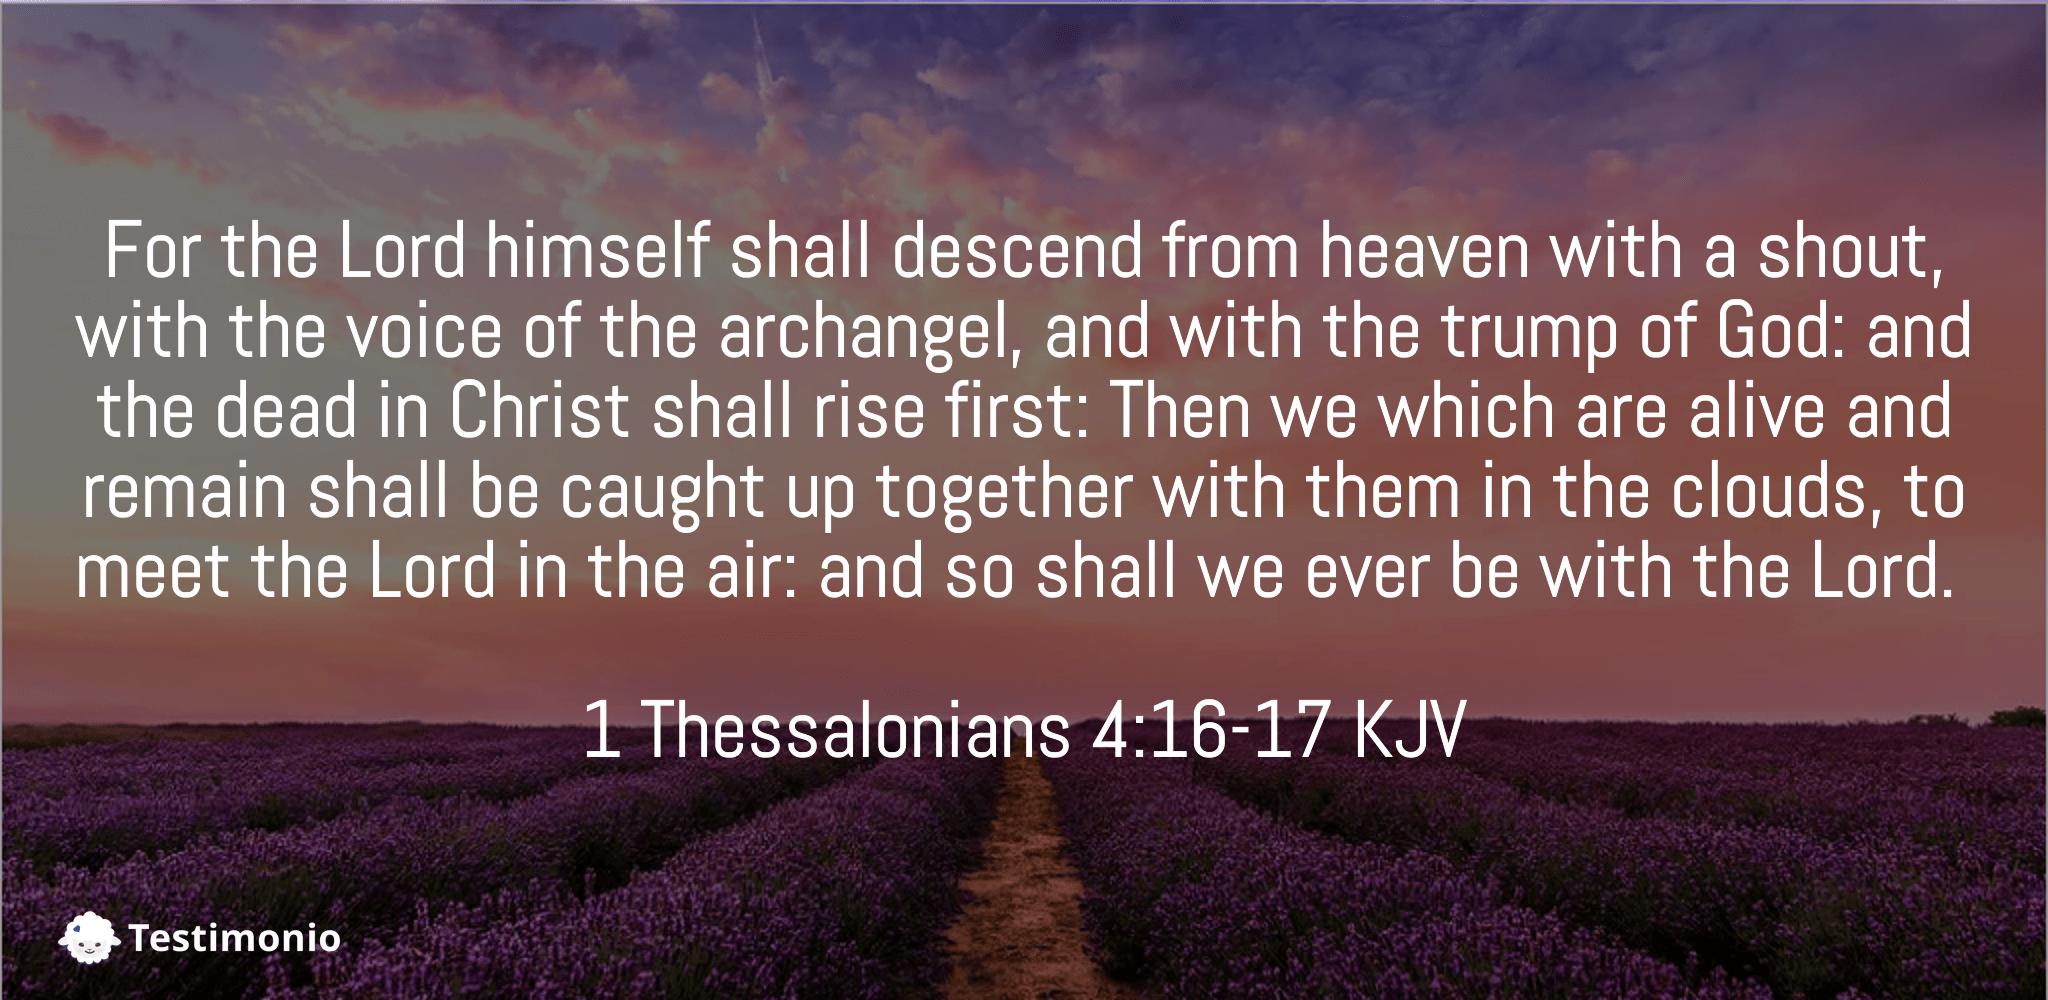 1 Thessalonians 4:16-17